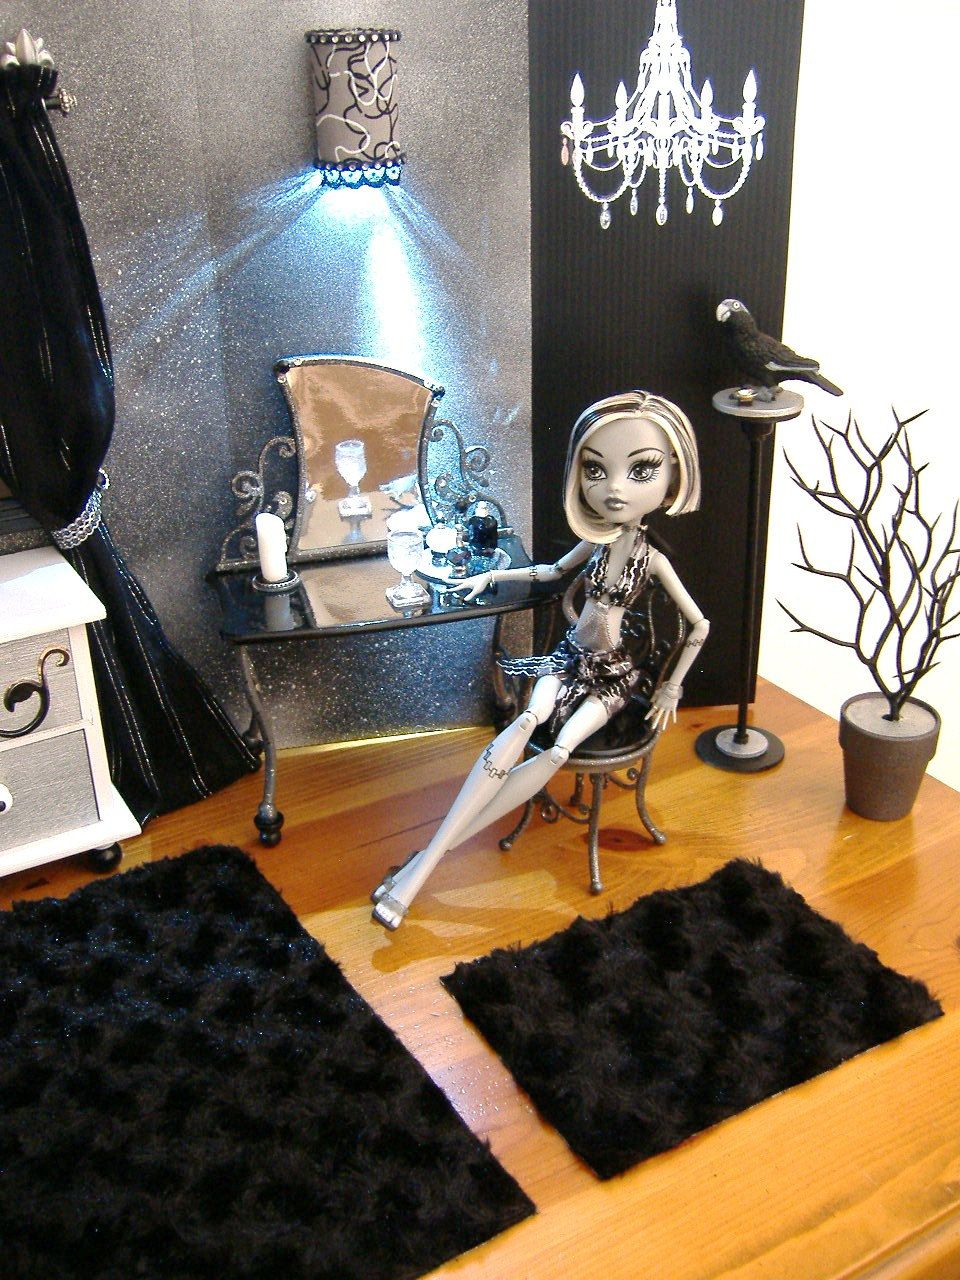 Monster High Bedroom Set Frankie Stein By Kaytoriginals On Etsy, $110.00